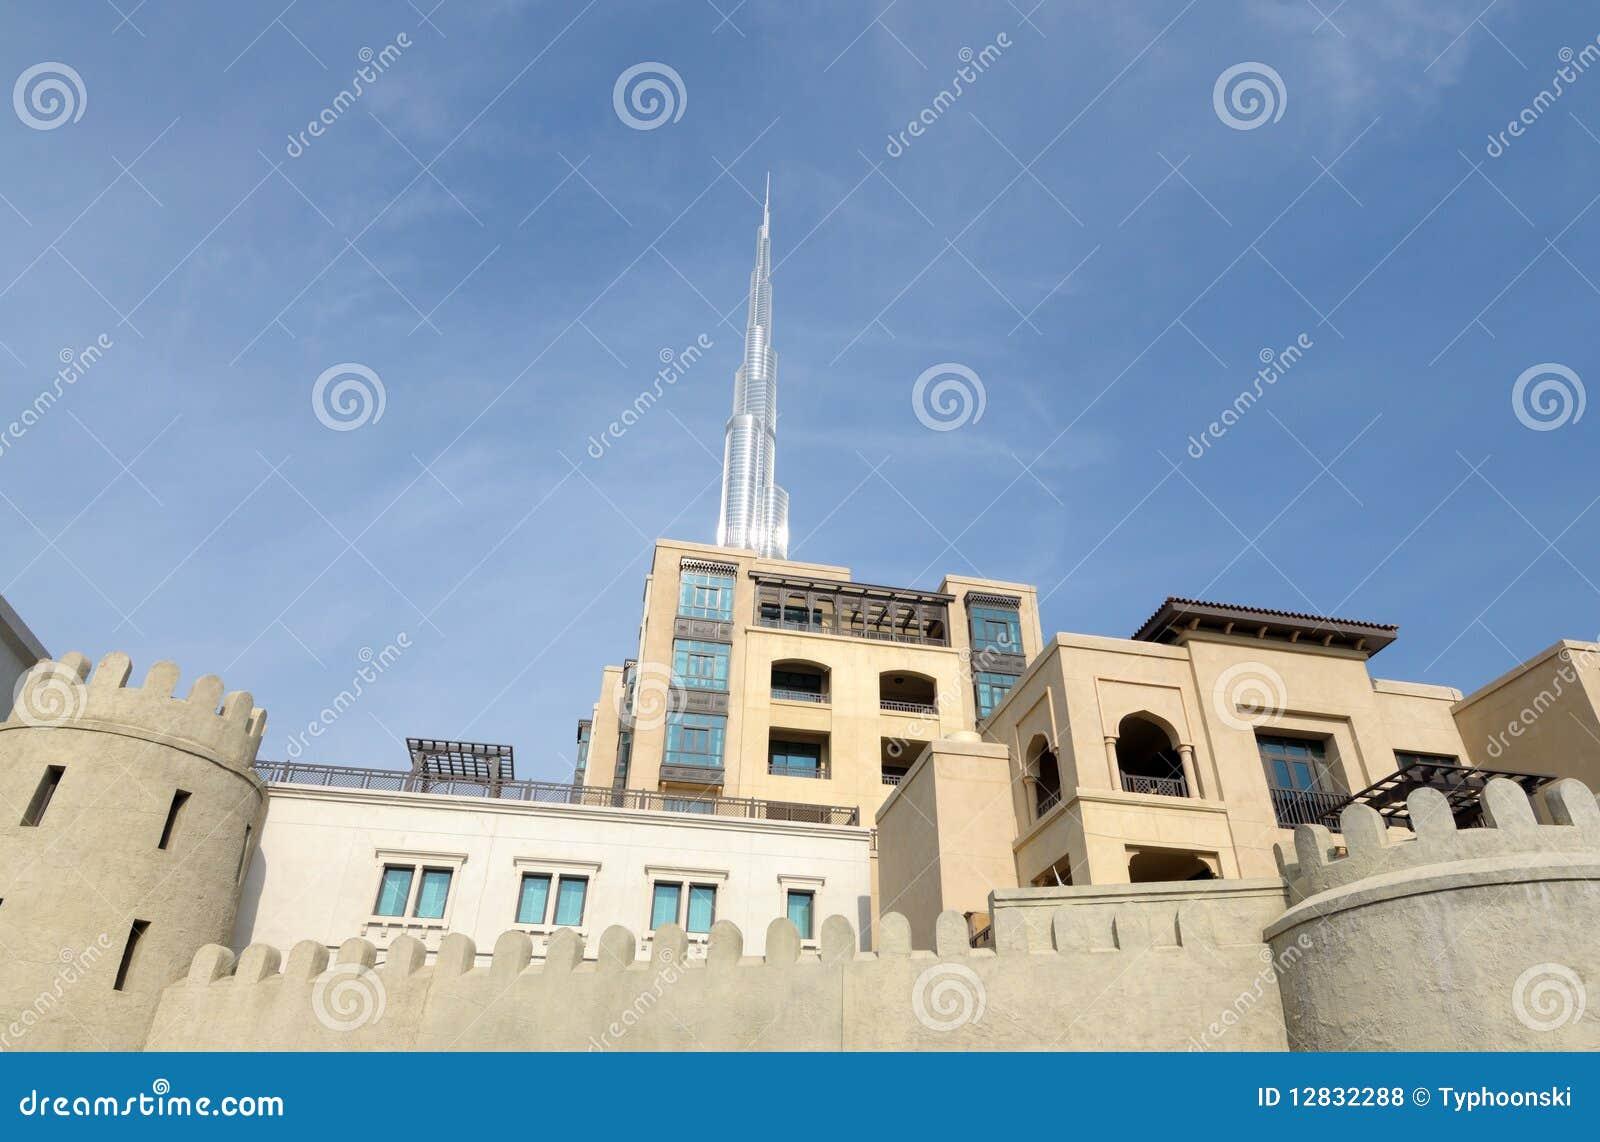 Modern architecture in dubai royalty free stock photos for Dubai architecture moderne